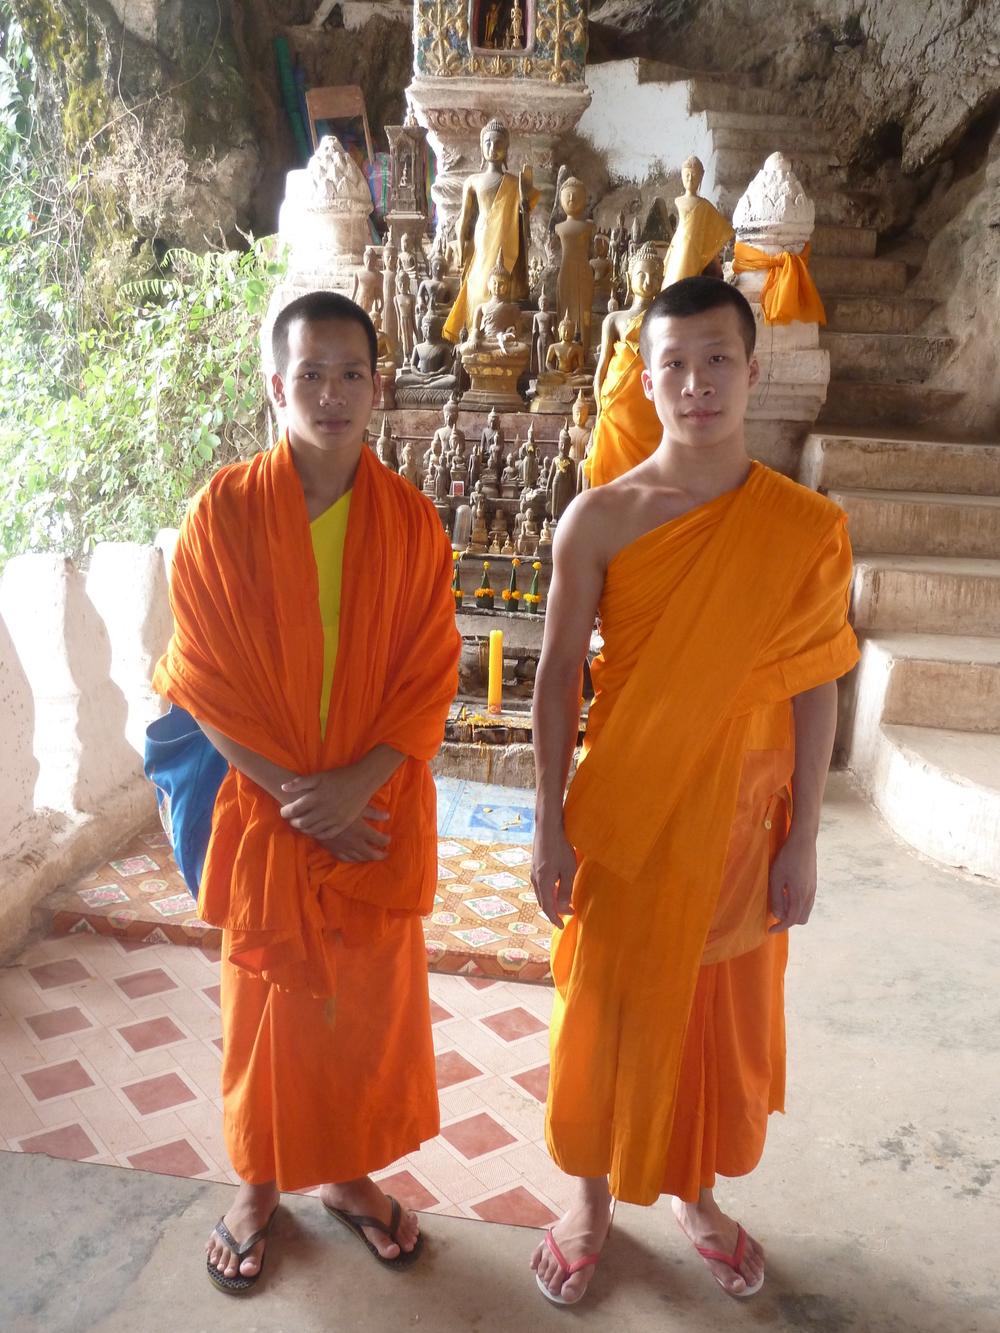 Sone and Vixai at a Buddhist shrine along the Mekong River.